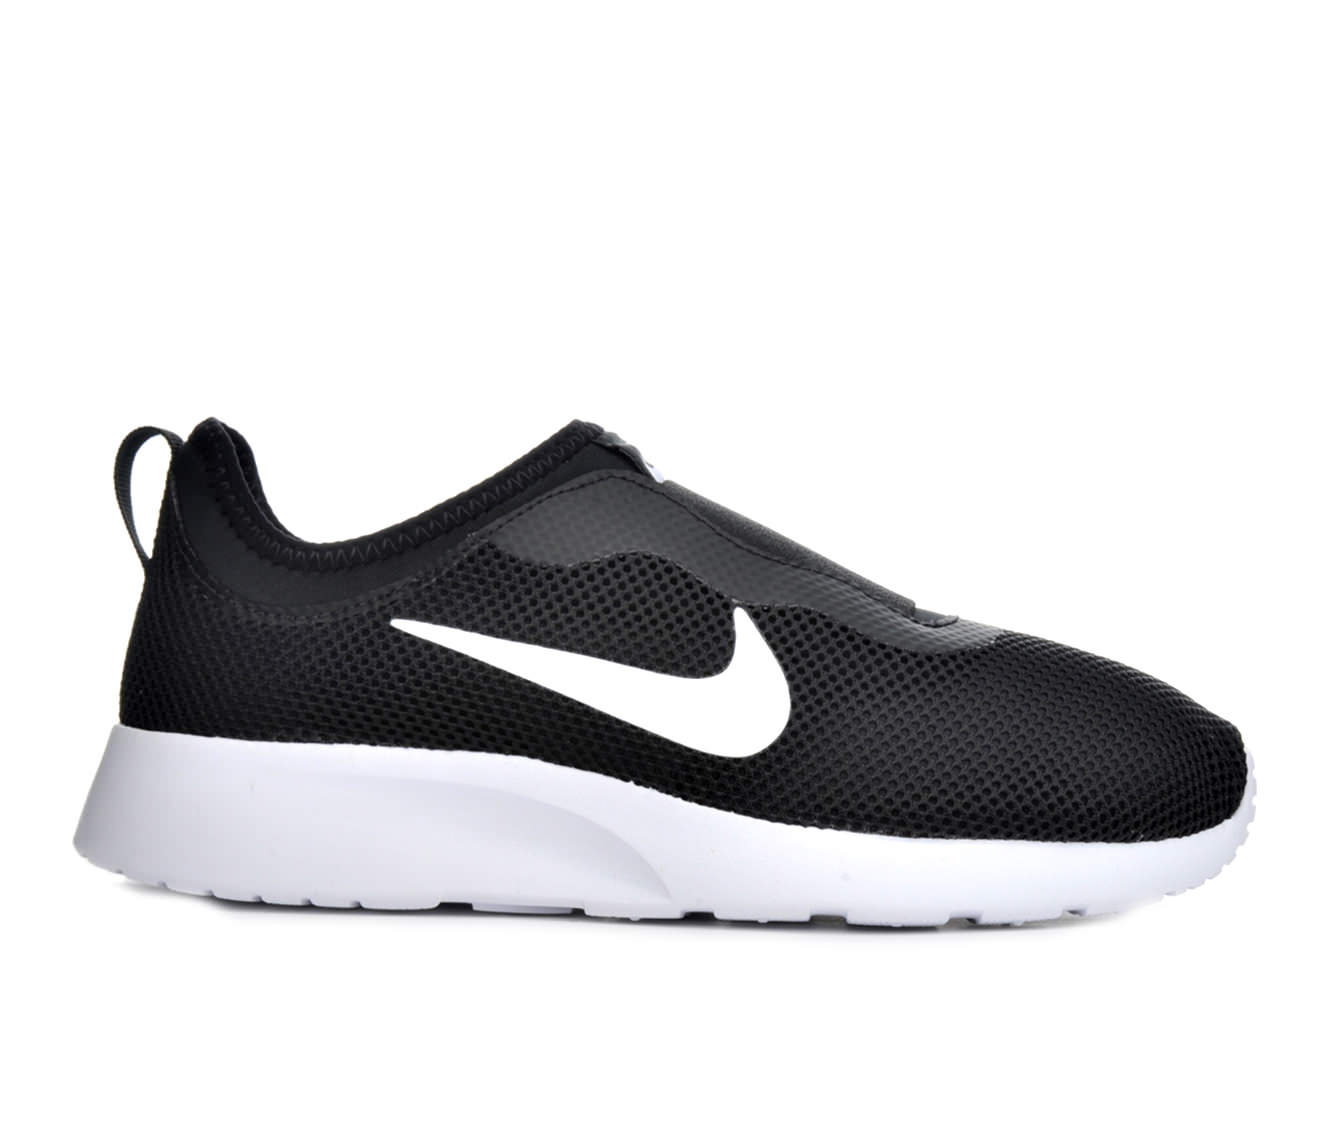 Women's Nike Tanjun Slip Sneakers (Black - Size 9.5) 1637810